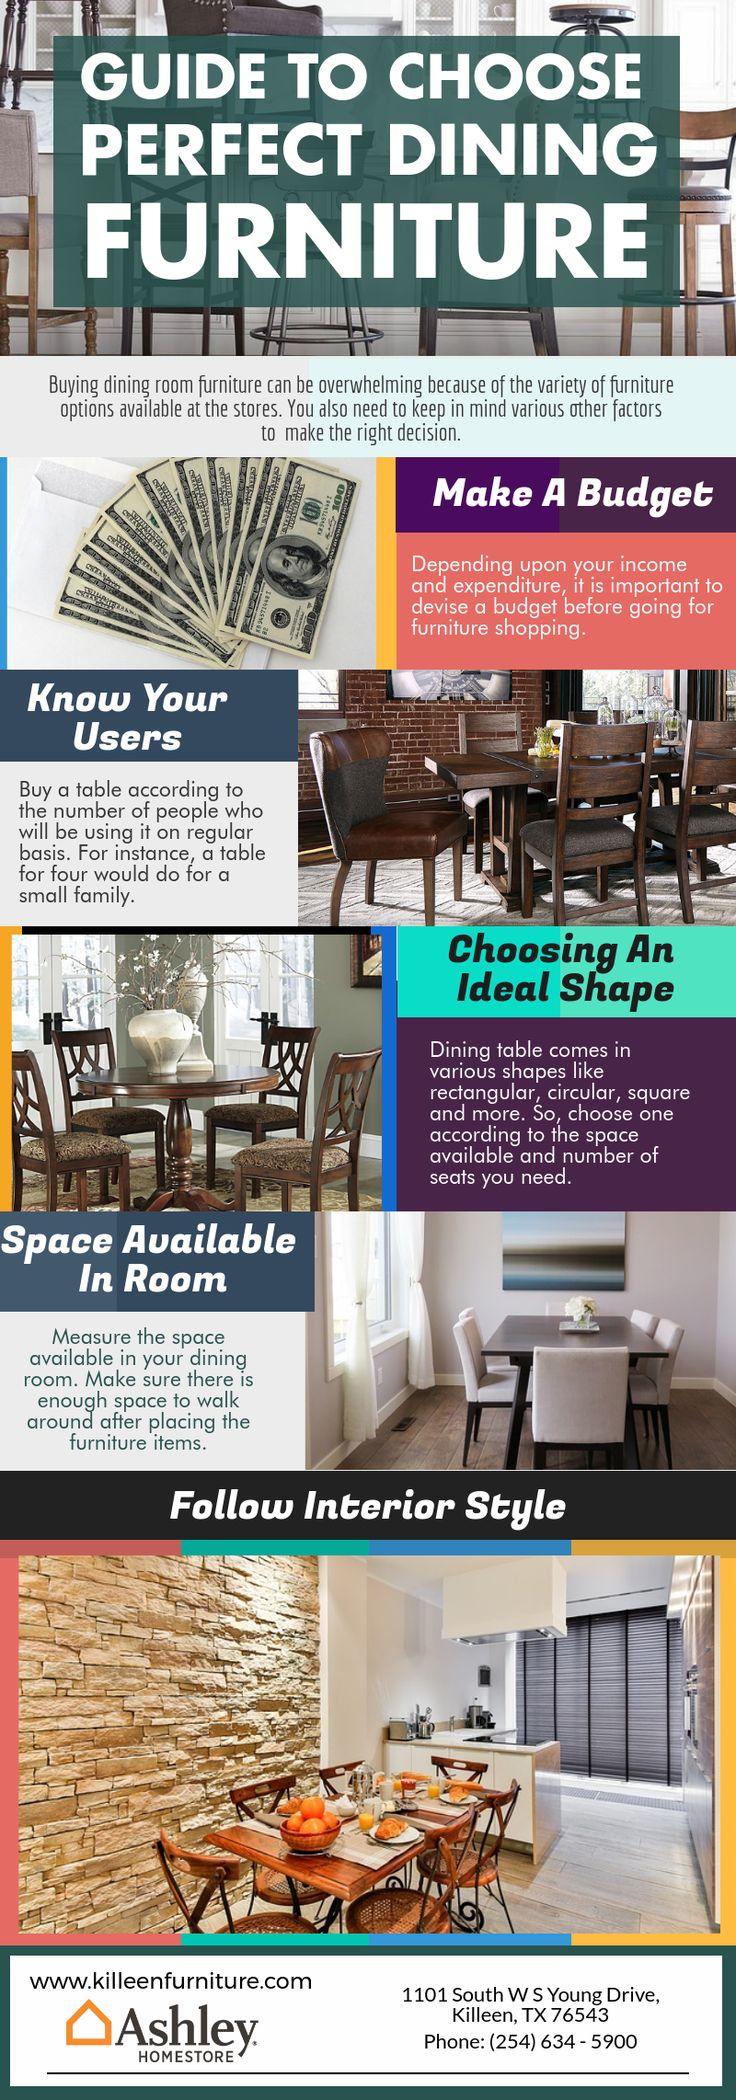 House Furniture In Killeen TX